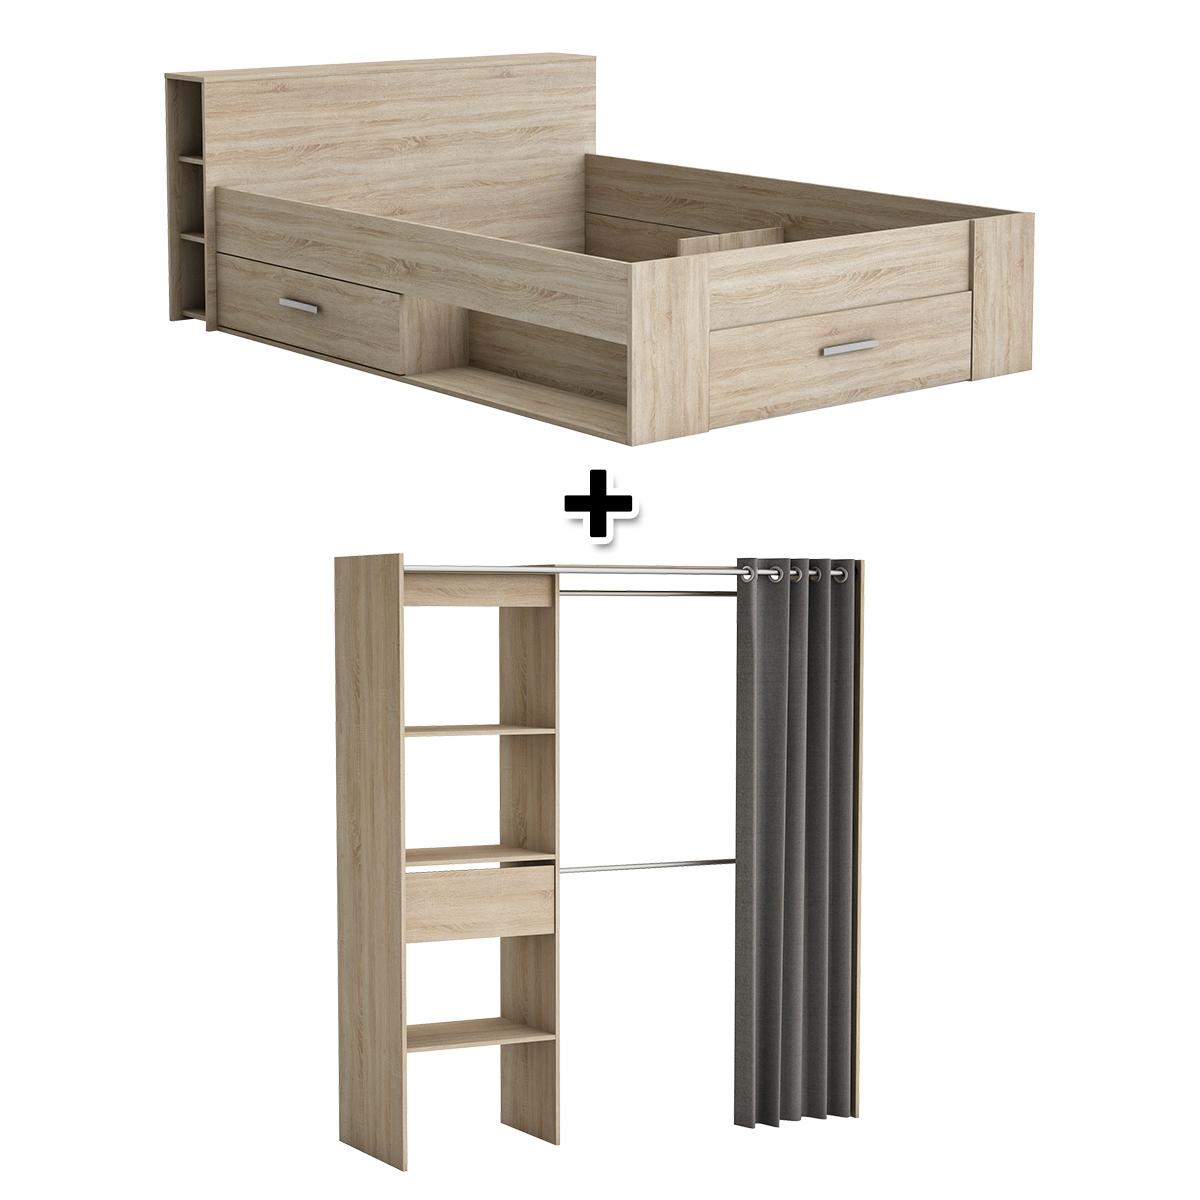 Lit 140X190 cm SMART ch�ne + armoire dressing MOKA ch�ne bross�